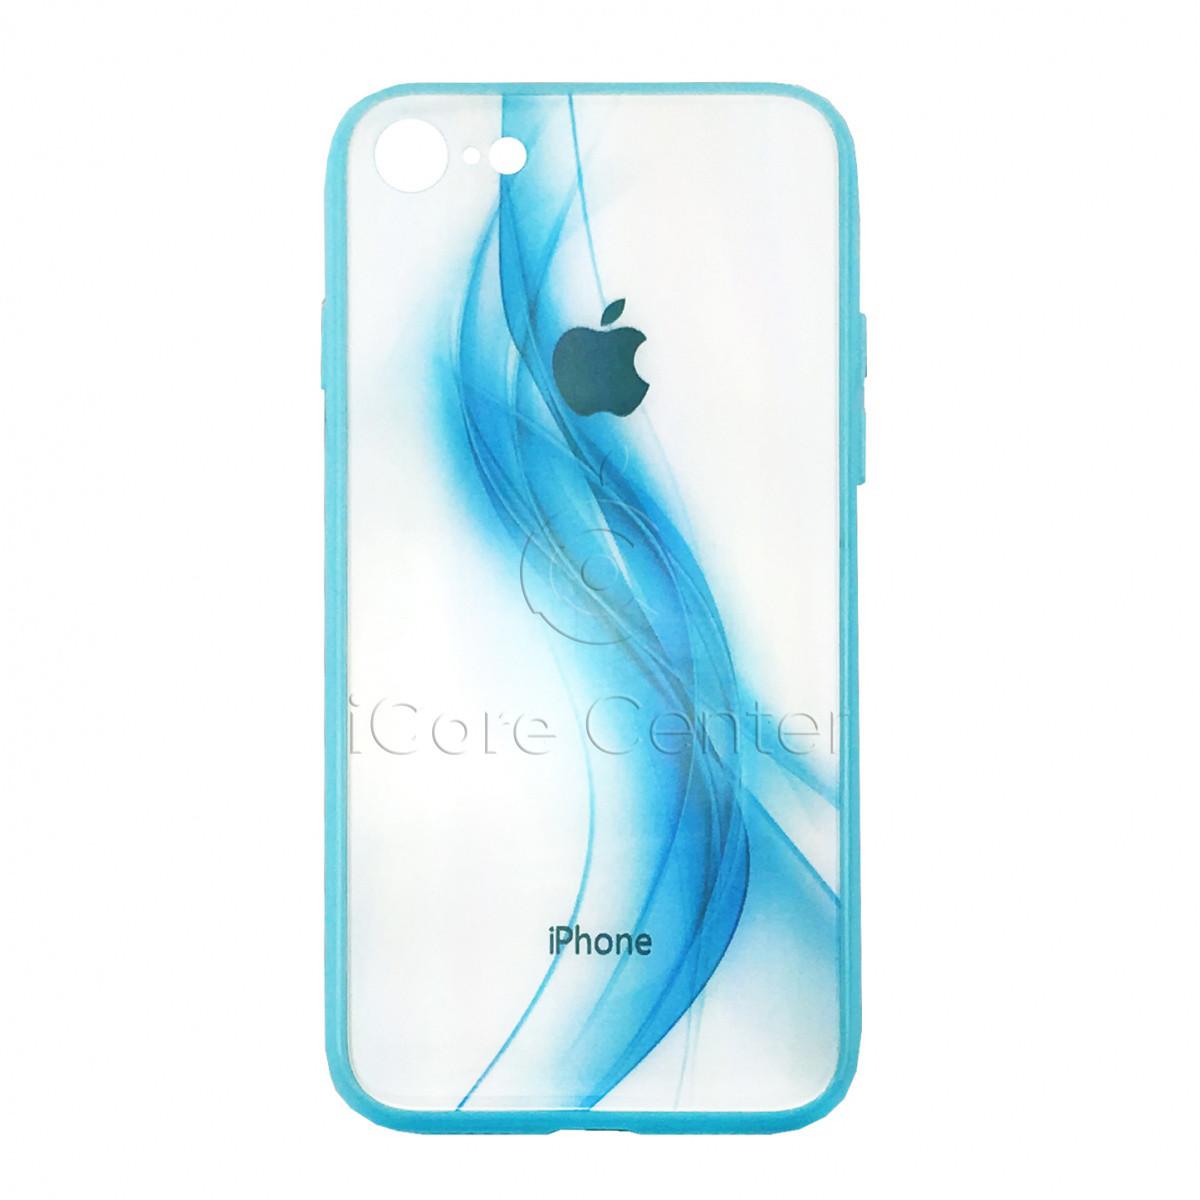 Чохол накладка на iPhone 7 / 8 Glass Polaris Smoke color Синій (Blue)